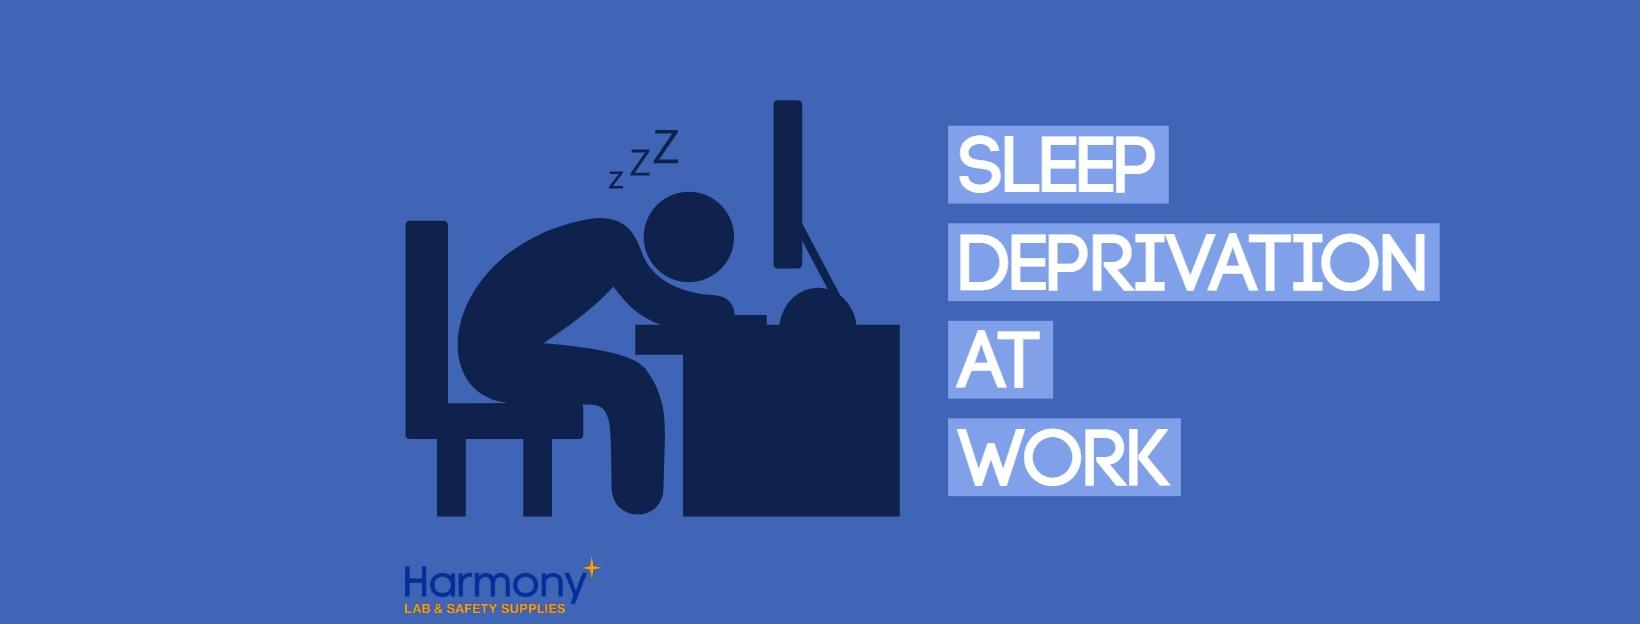 sleep deprivation at work blog post